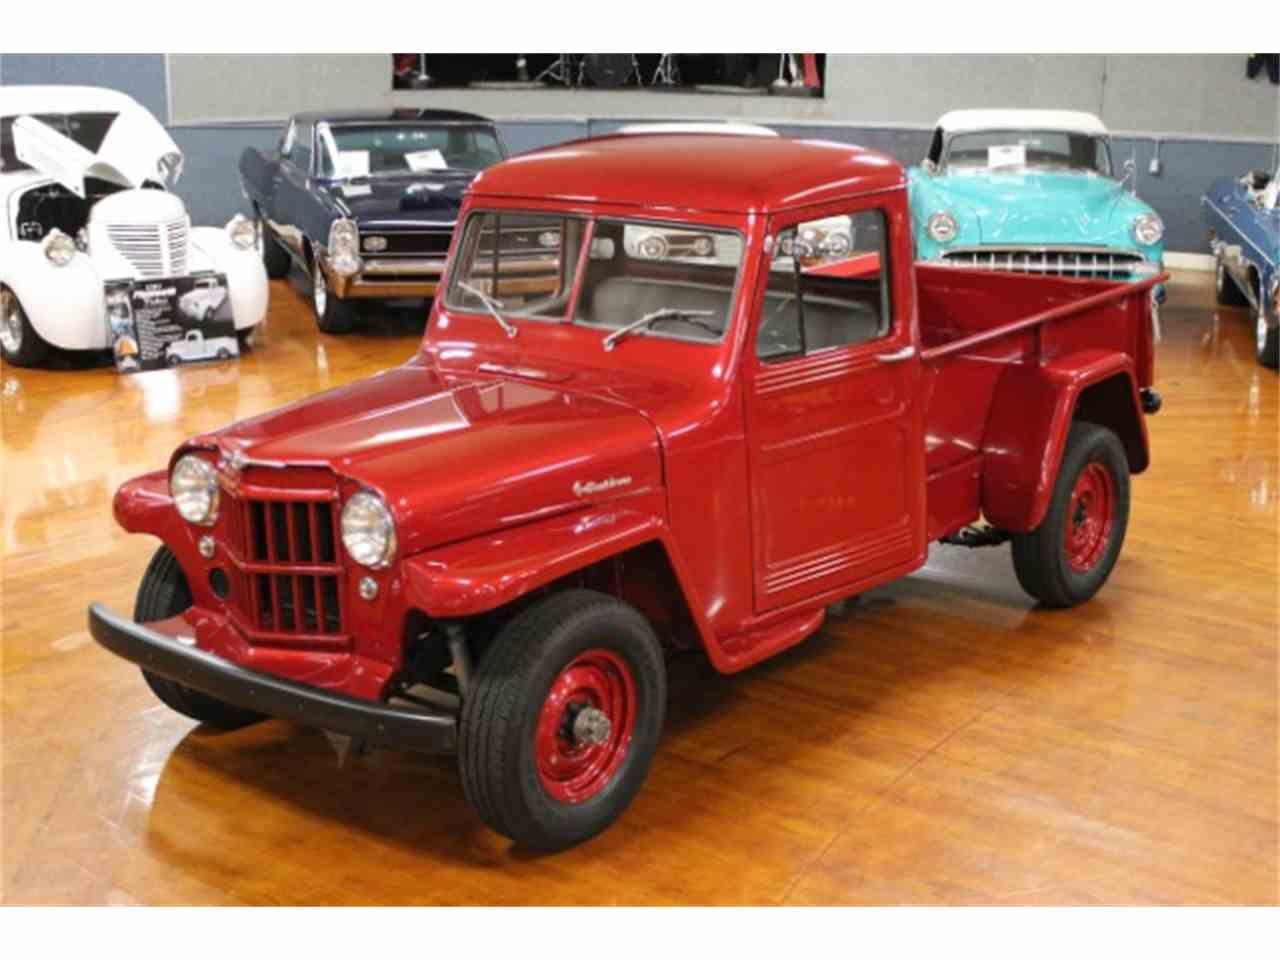 1960 willys jeep for sale cc 903628. Black Bedroom Furniture Sets. Home Design Ideas